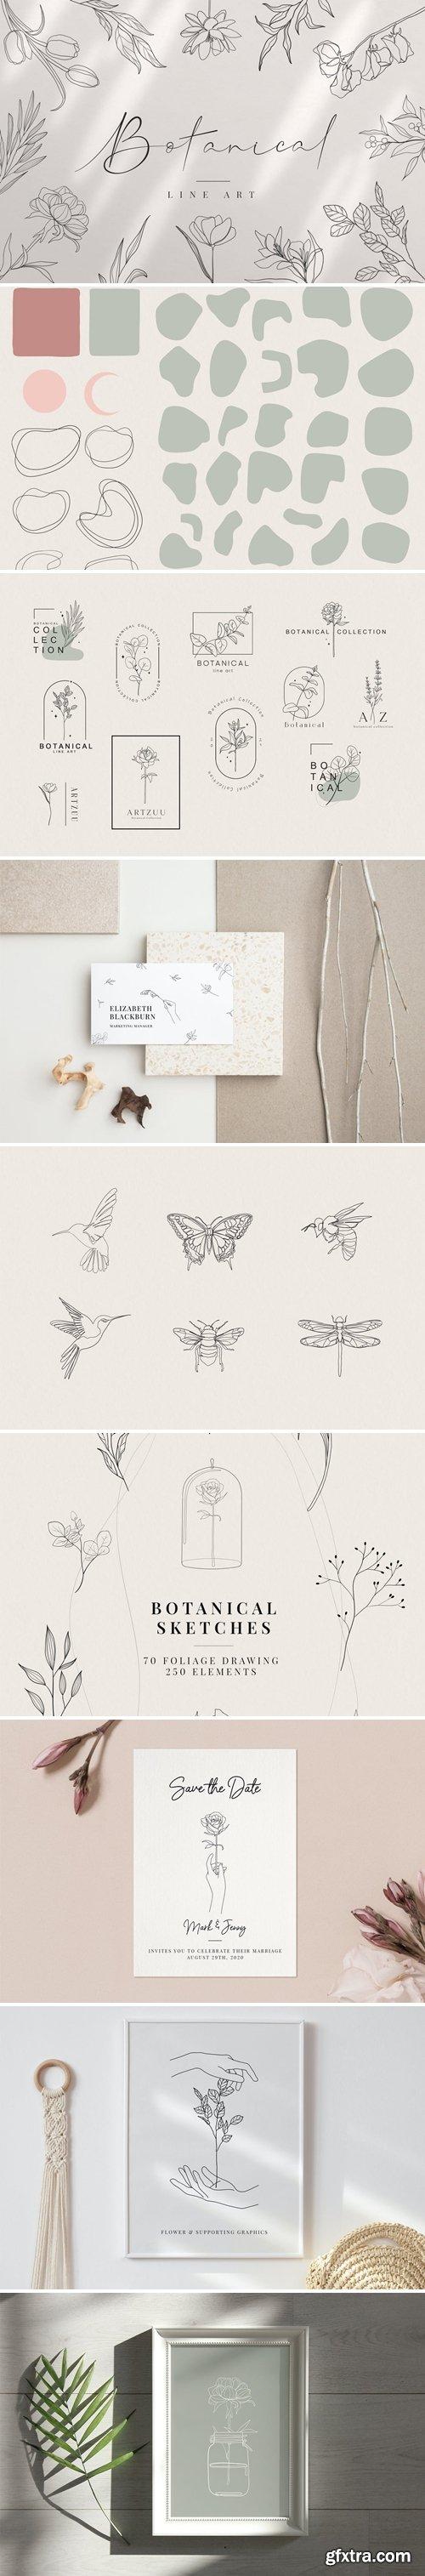 Botanical Collection